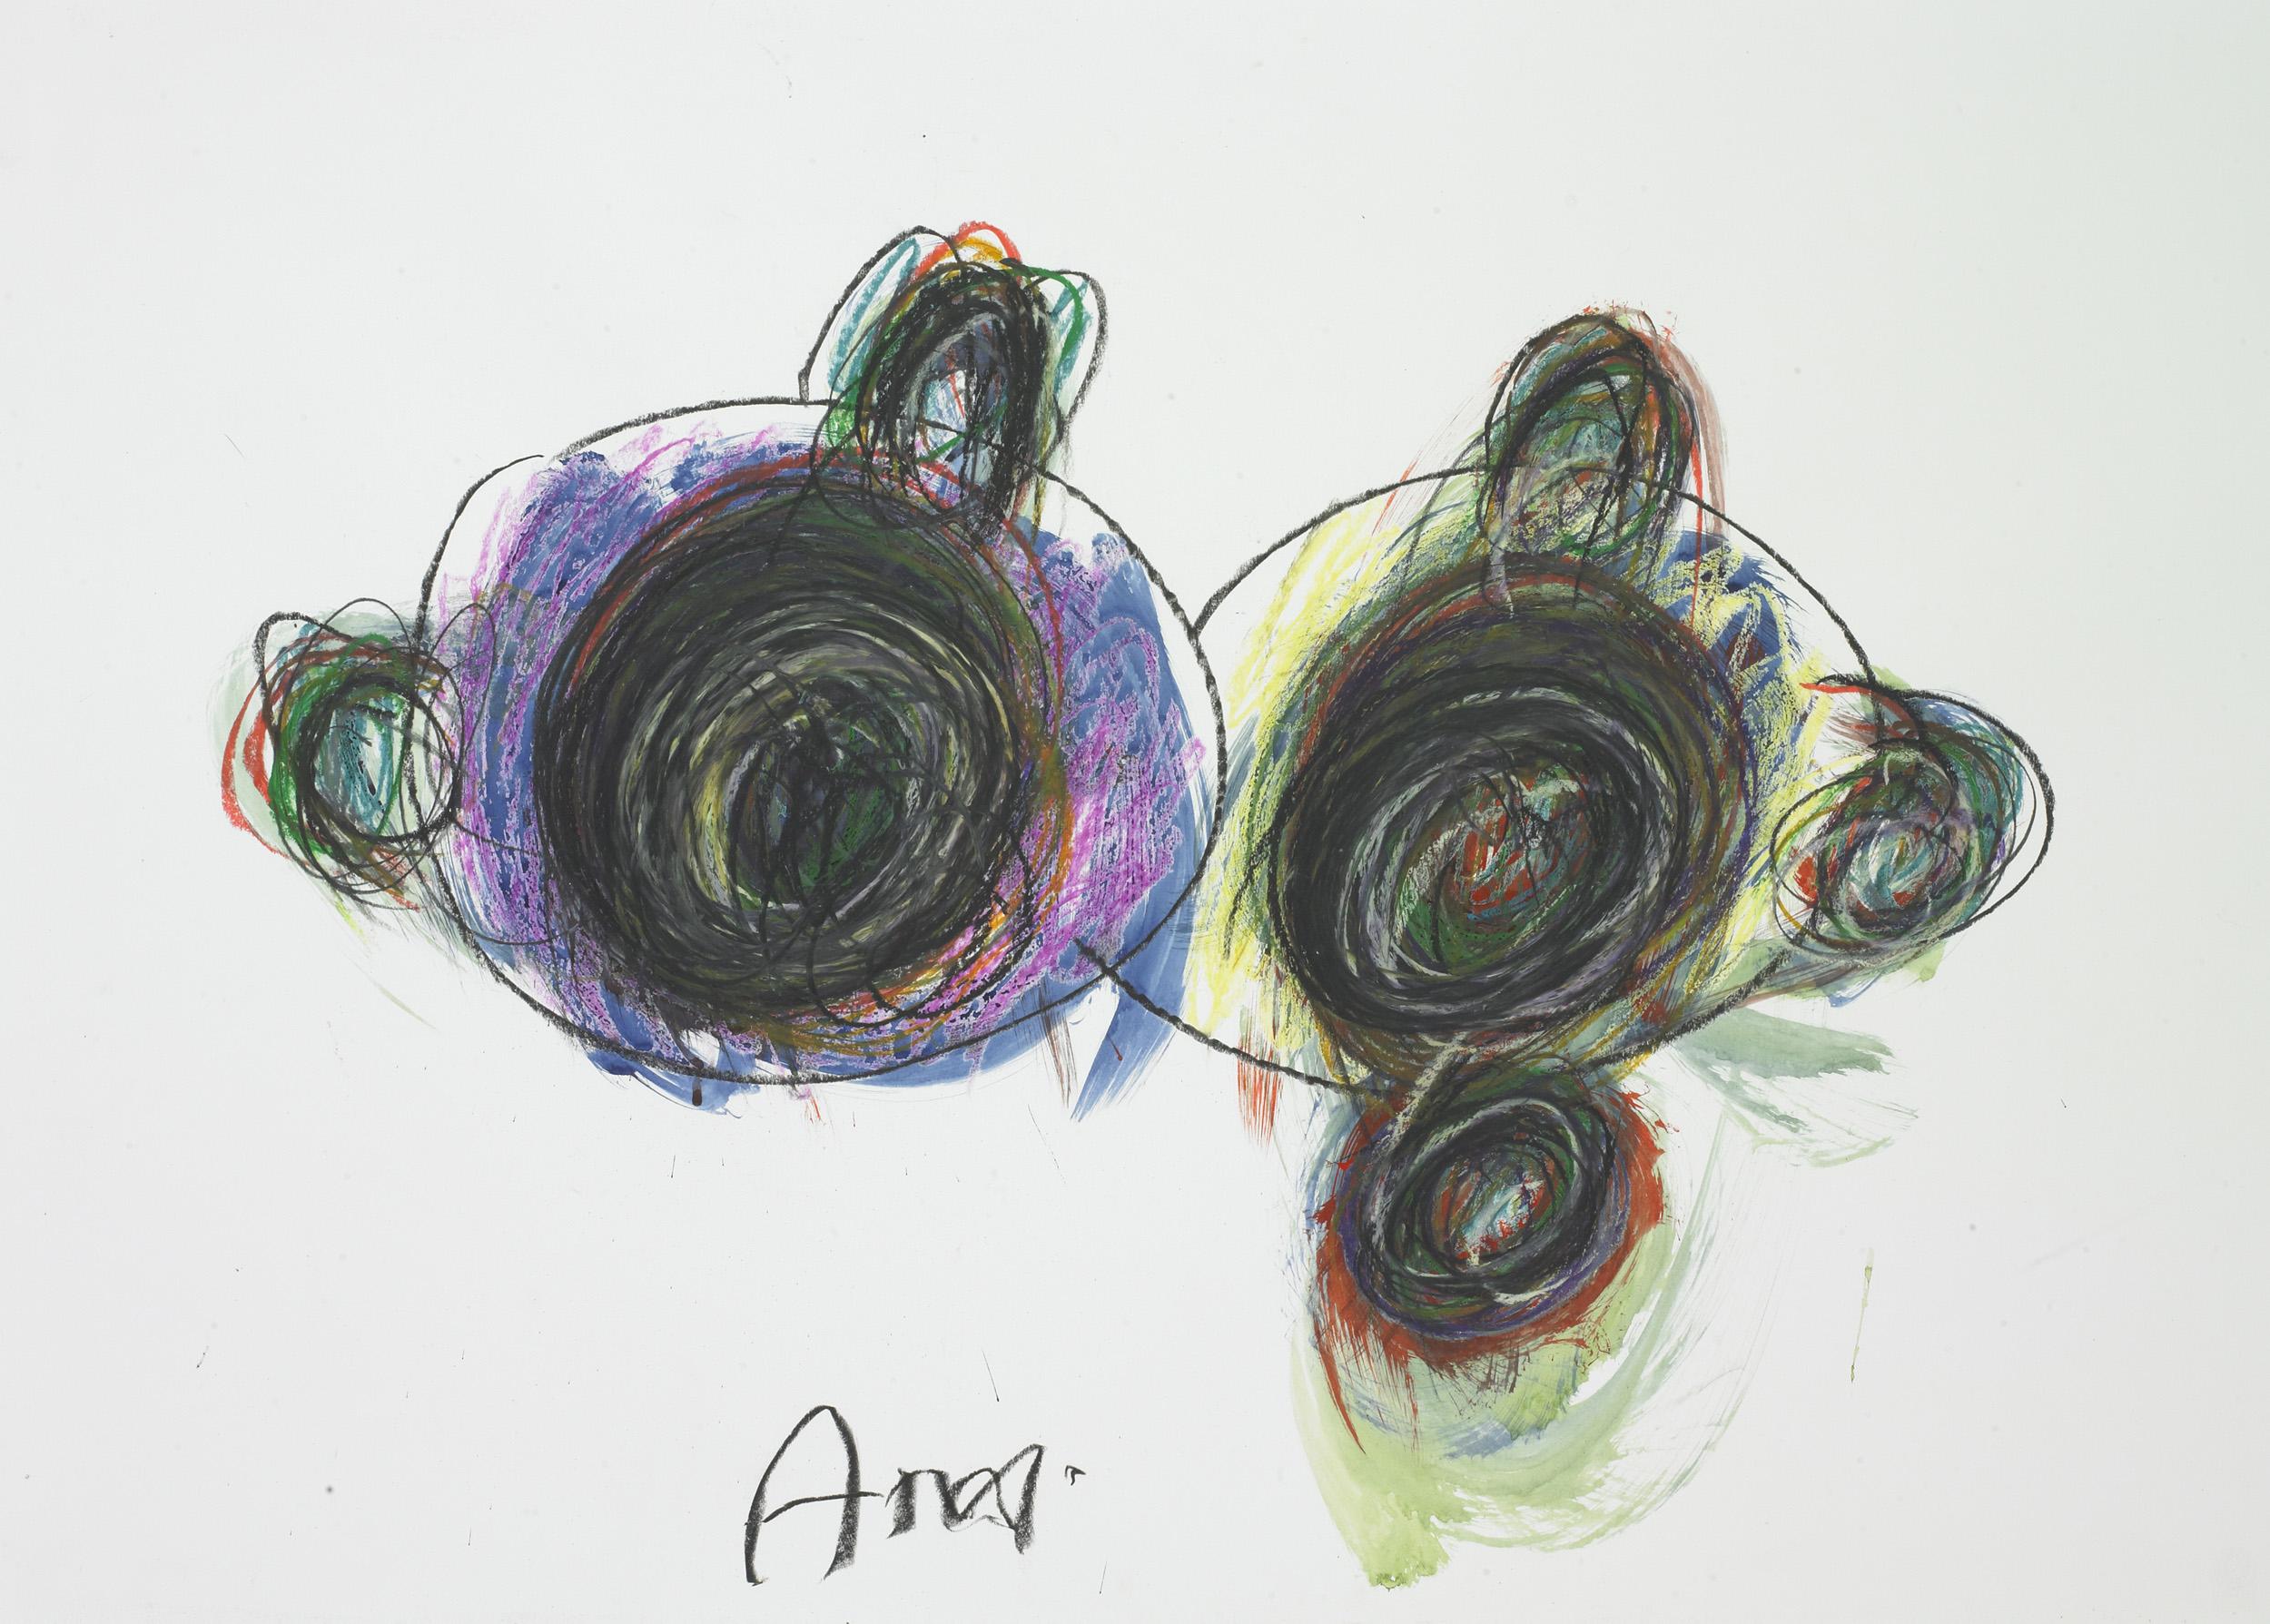 schmidt arnold - Vogel / Bird